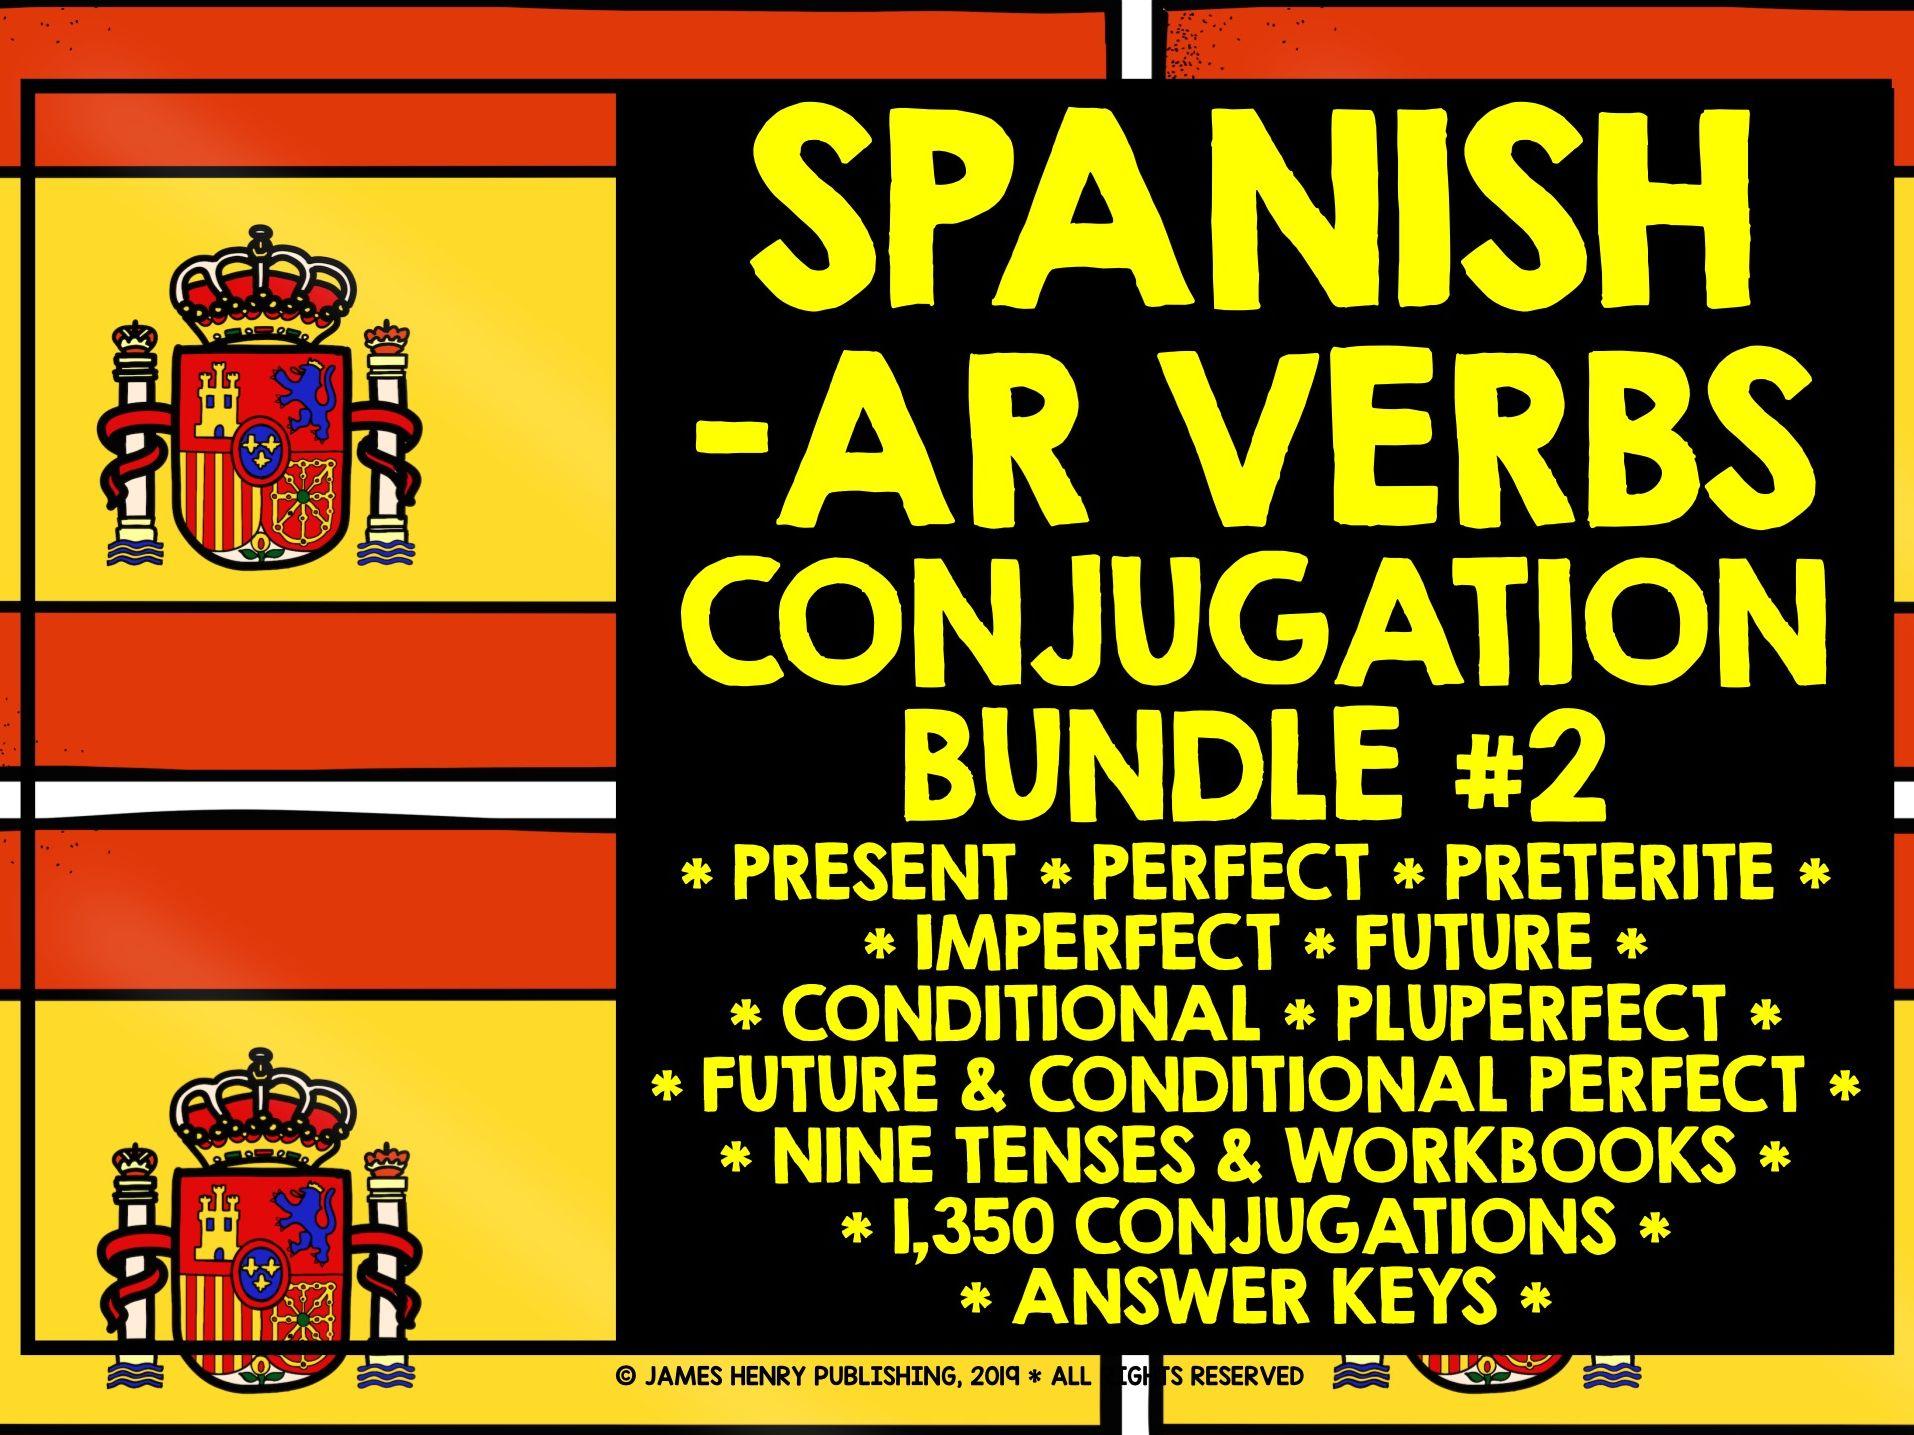 SPANISH AR VERBS ALEVEL CONJUGATION PRACTICE BUNDLE #2